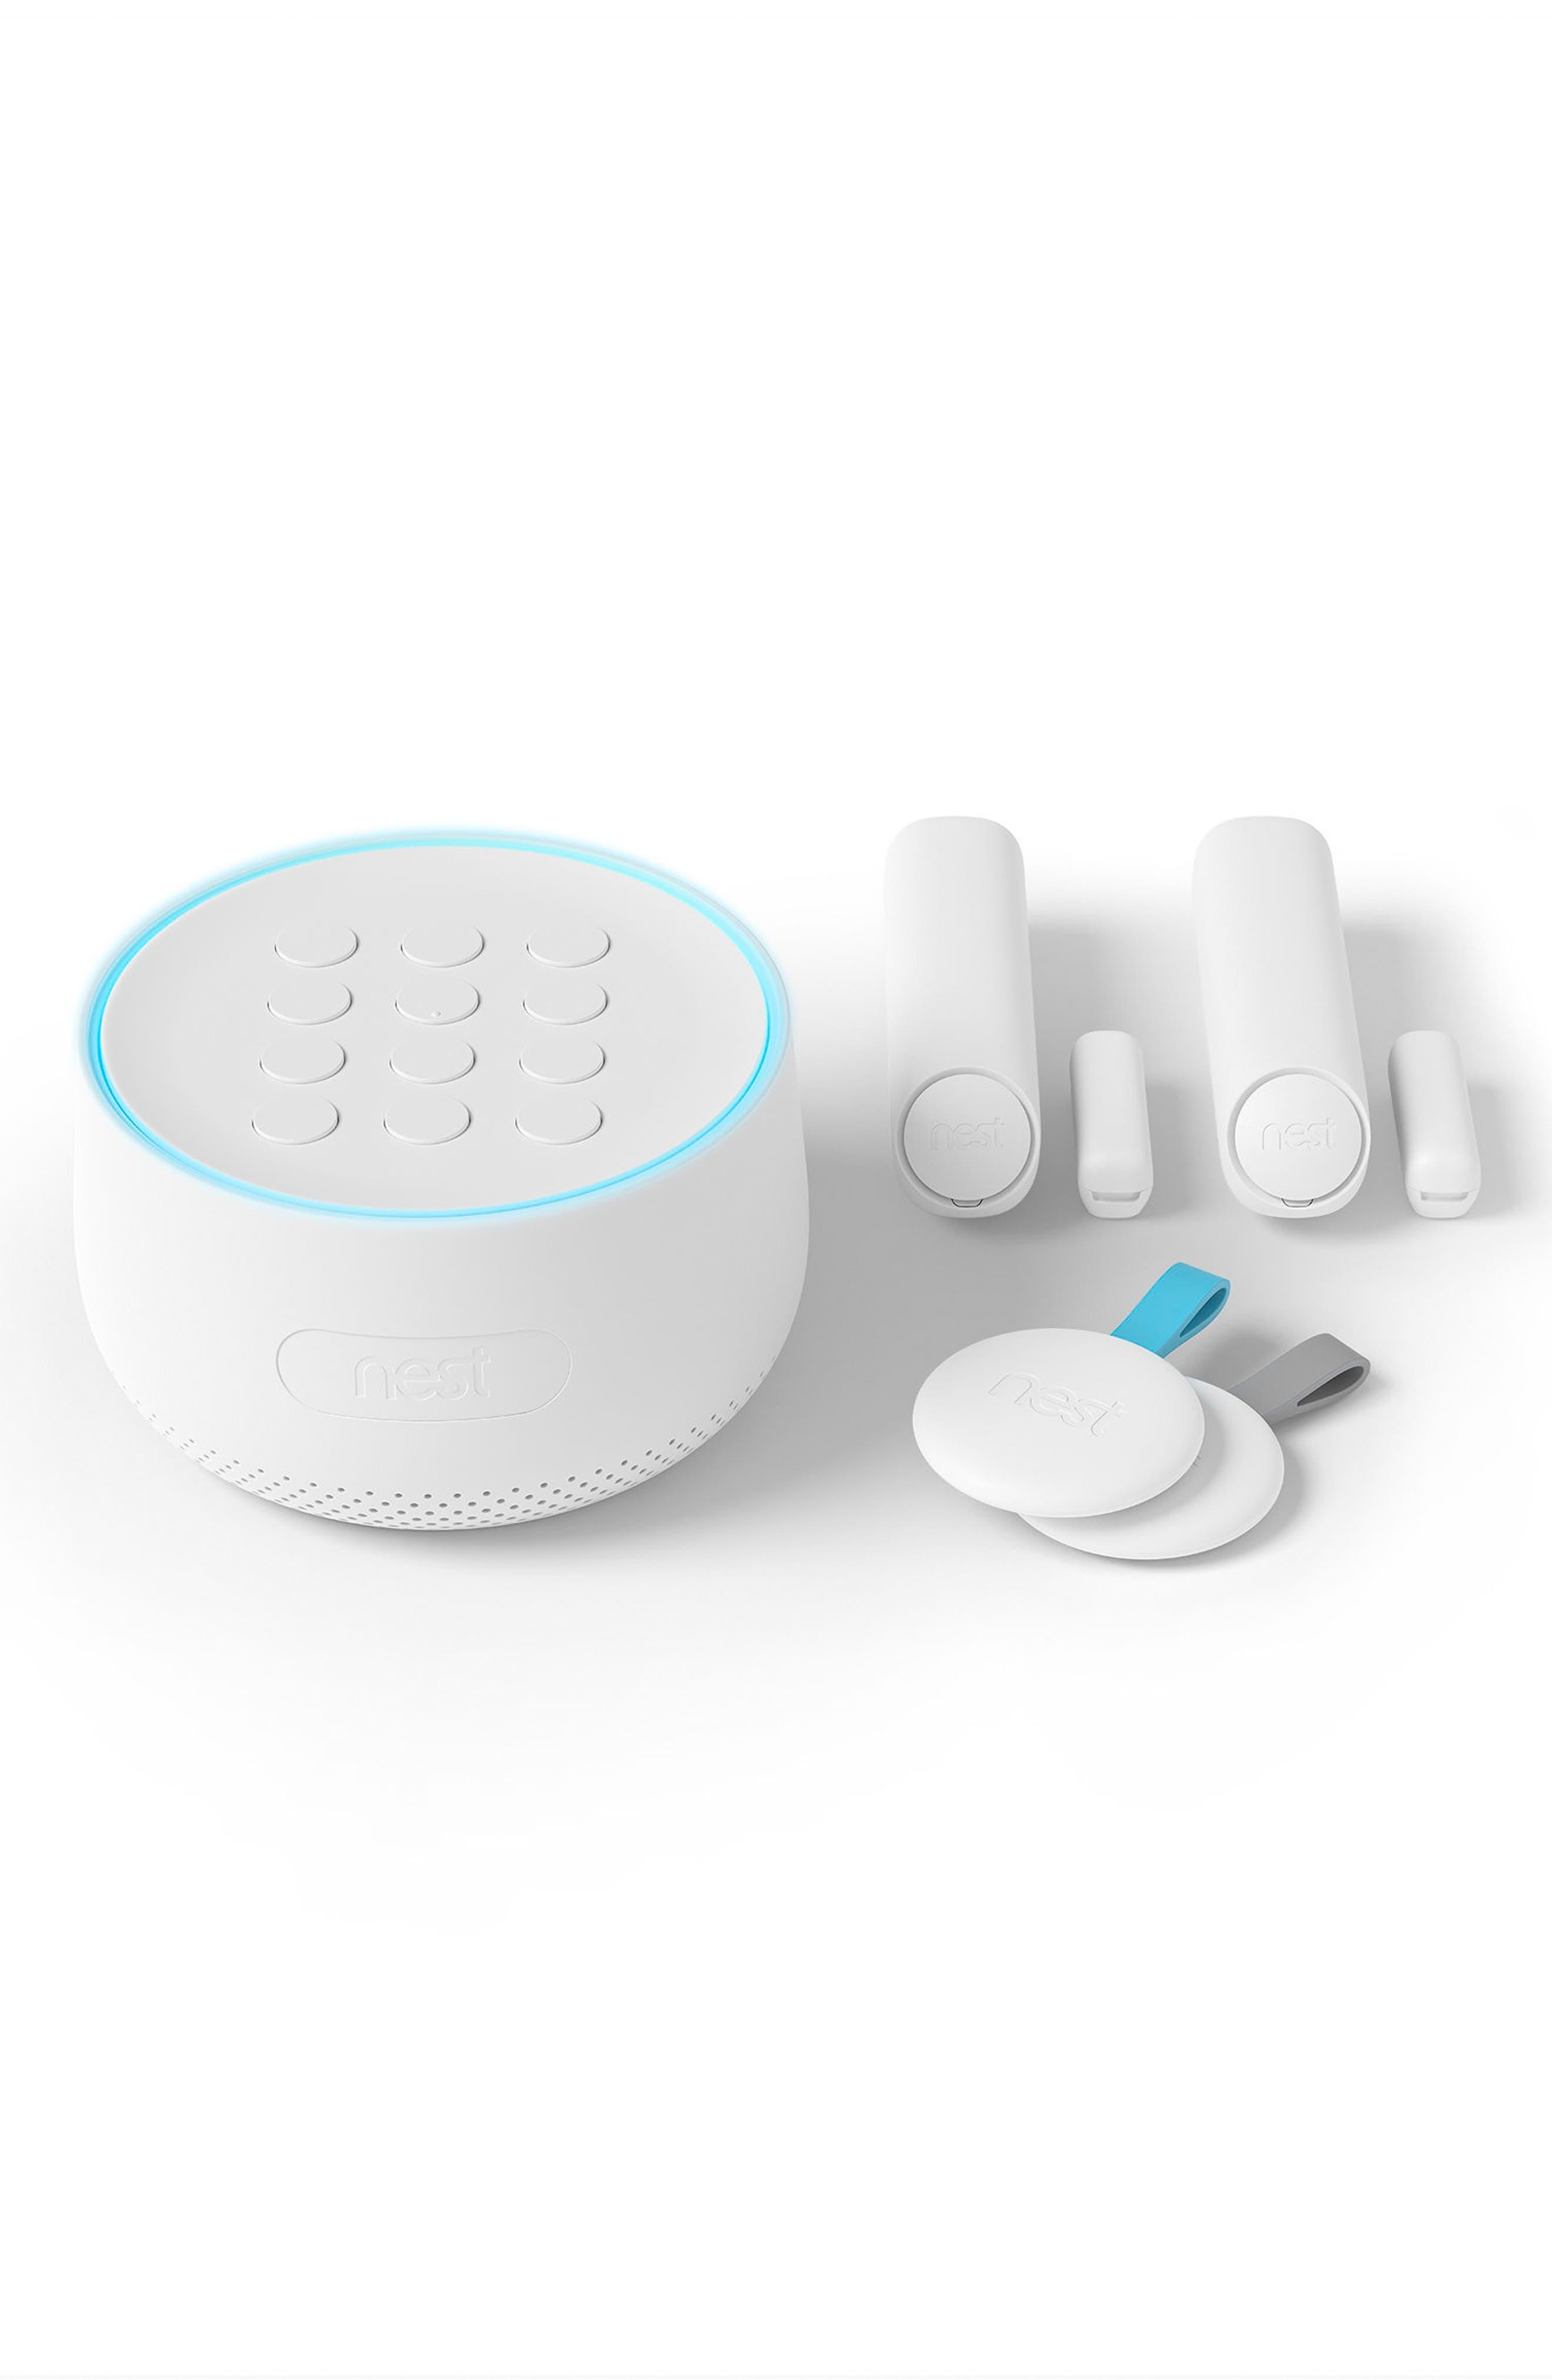 Main Image - Nest Secure Alarm System